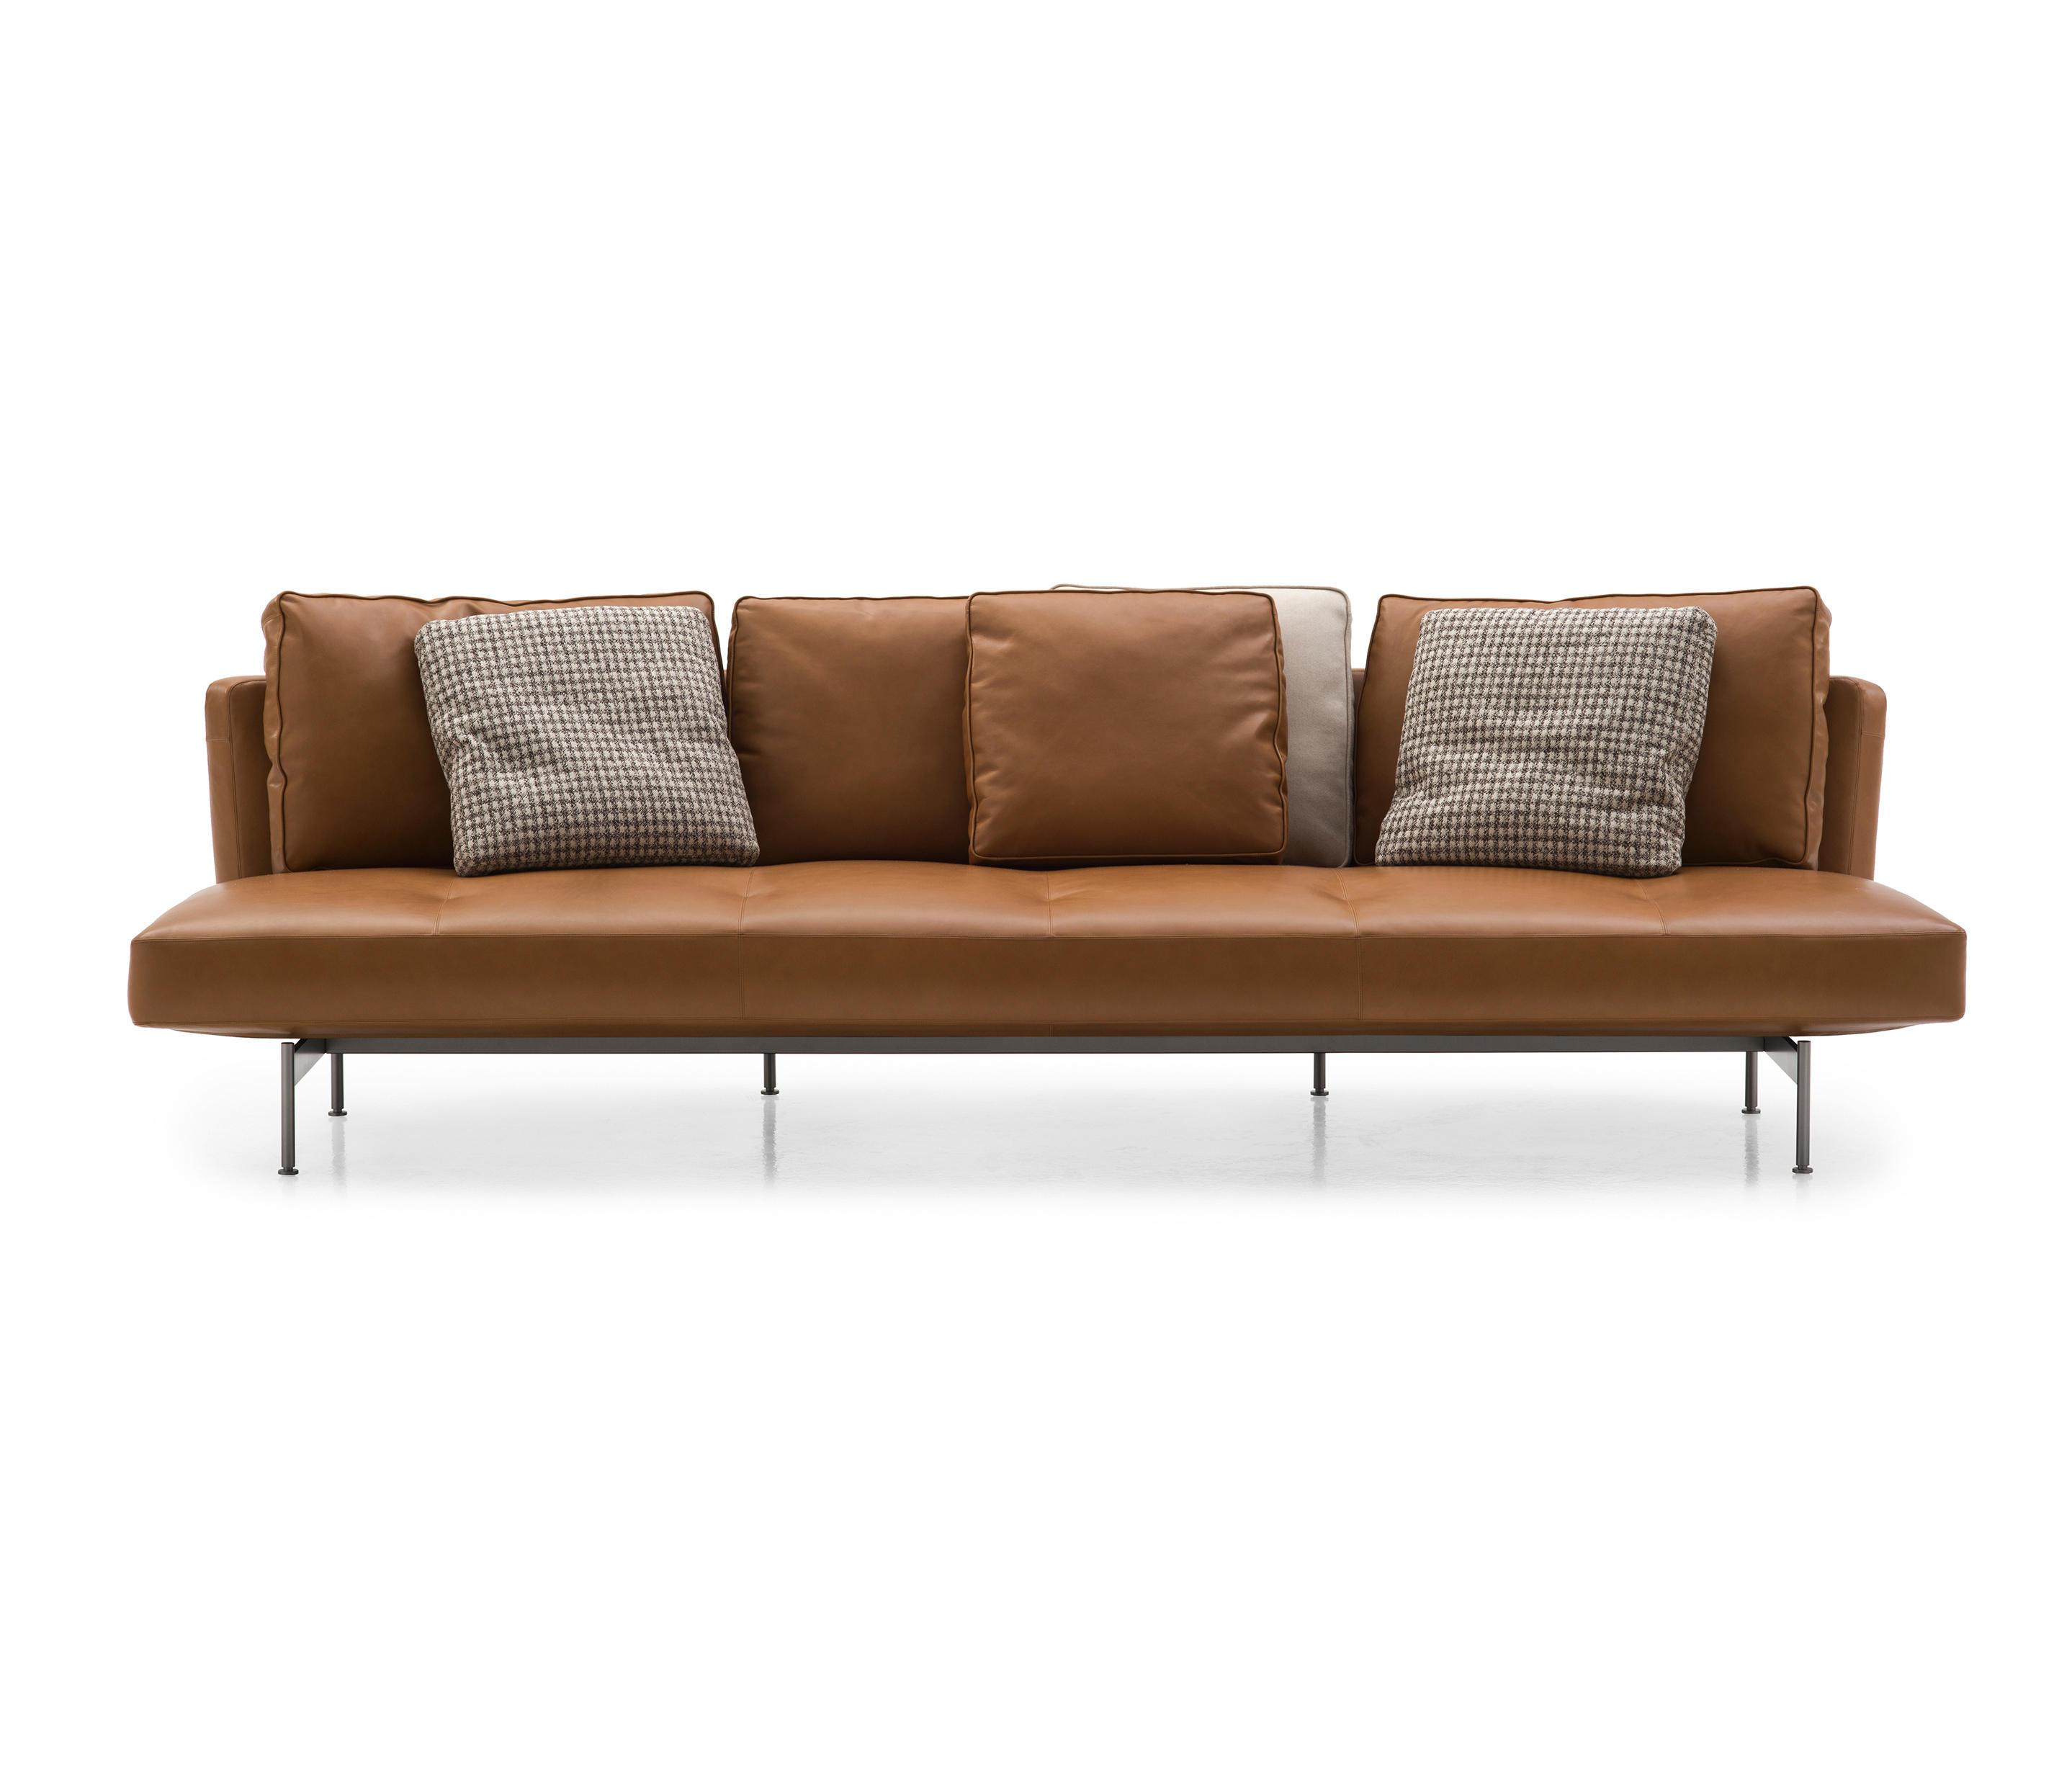 SAKé Modular Sofa by Piero Lissoni for B&B Italia